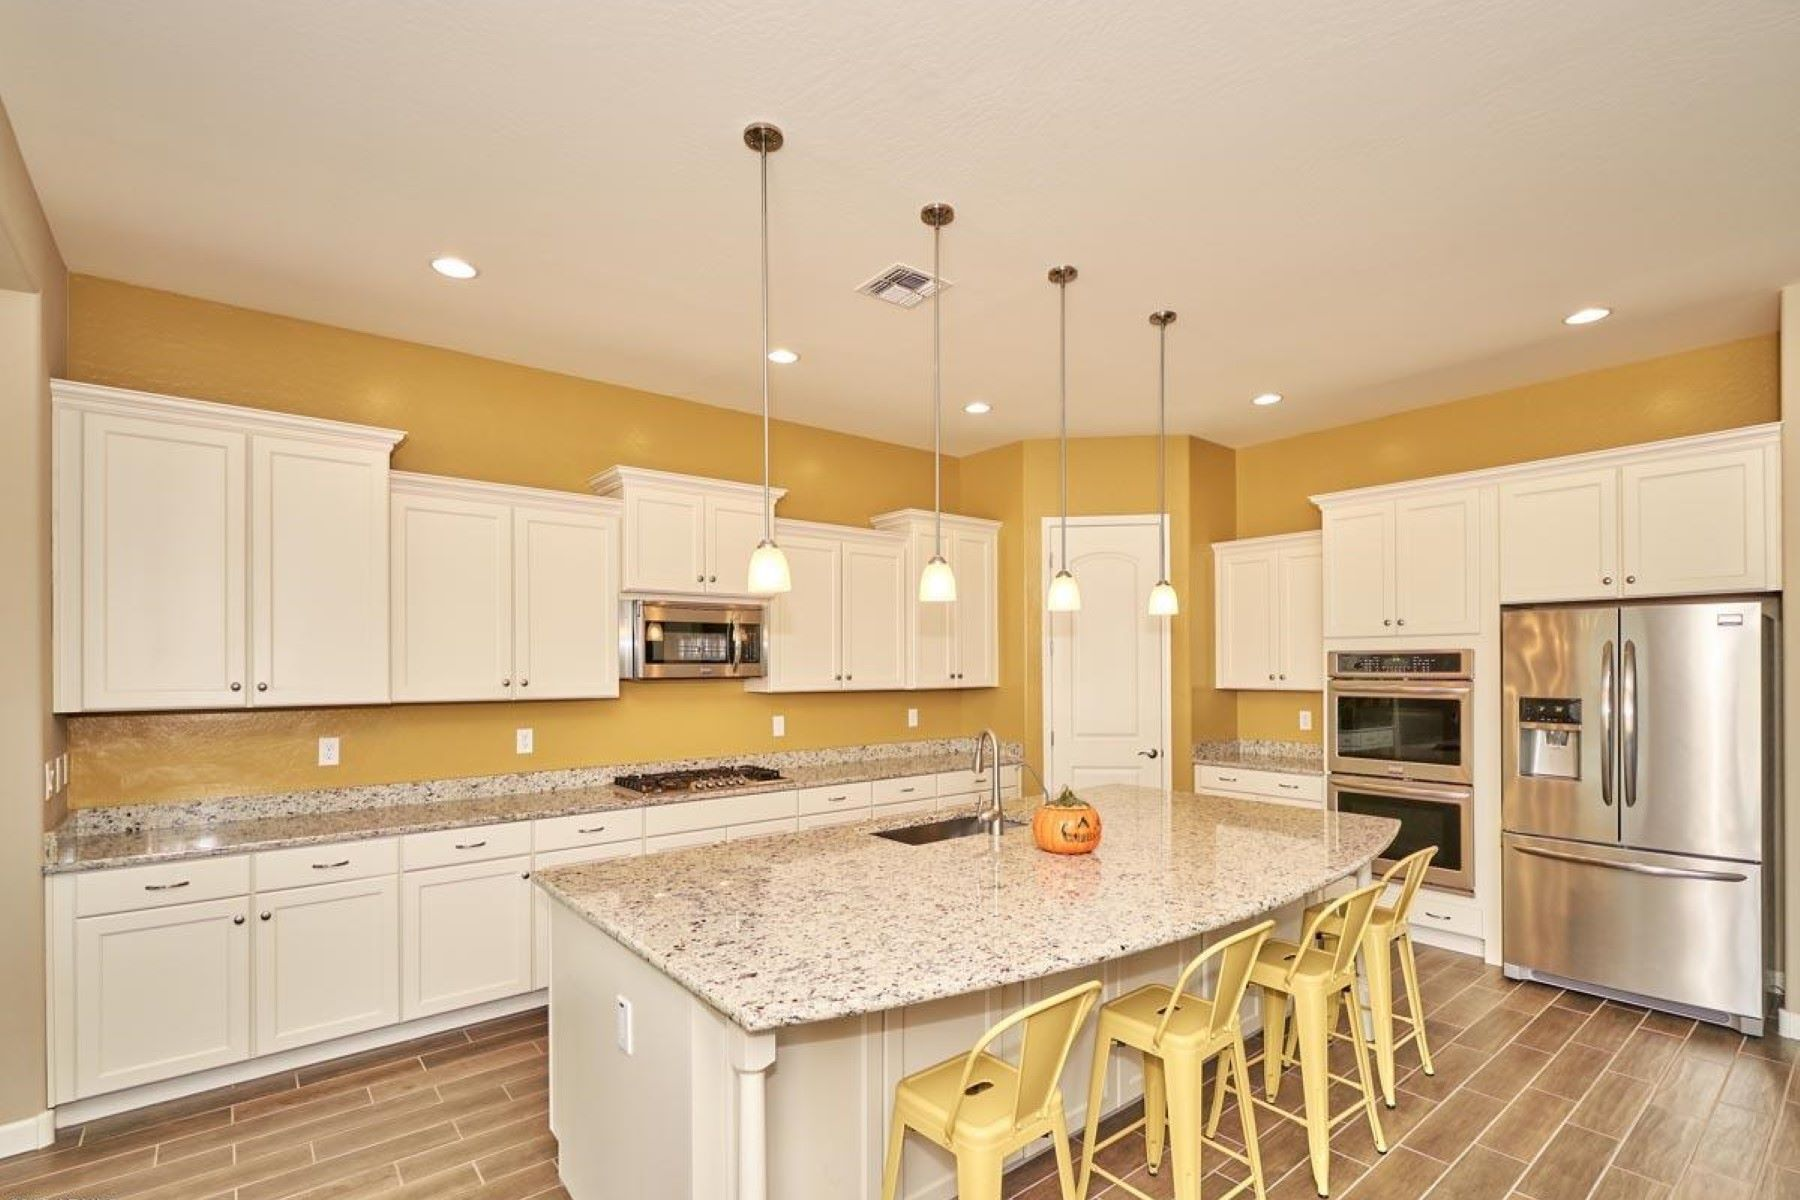 Single Family Homes for Sale at Emperor Estates 19760 E Raven Drive Queen Creek, Arizona 85142 United States